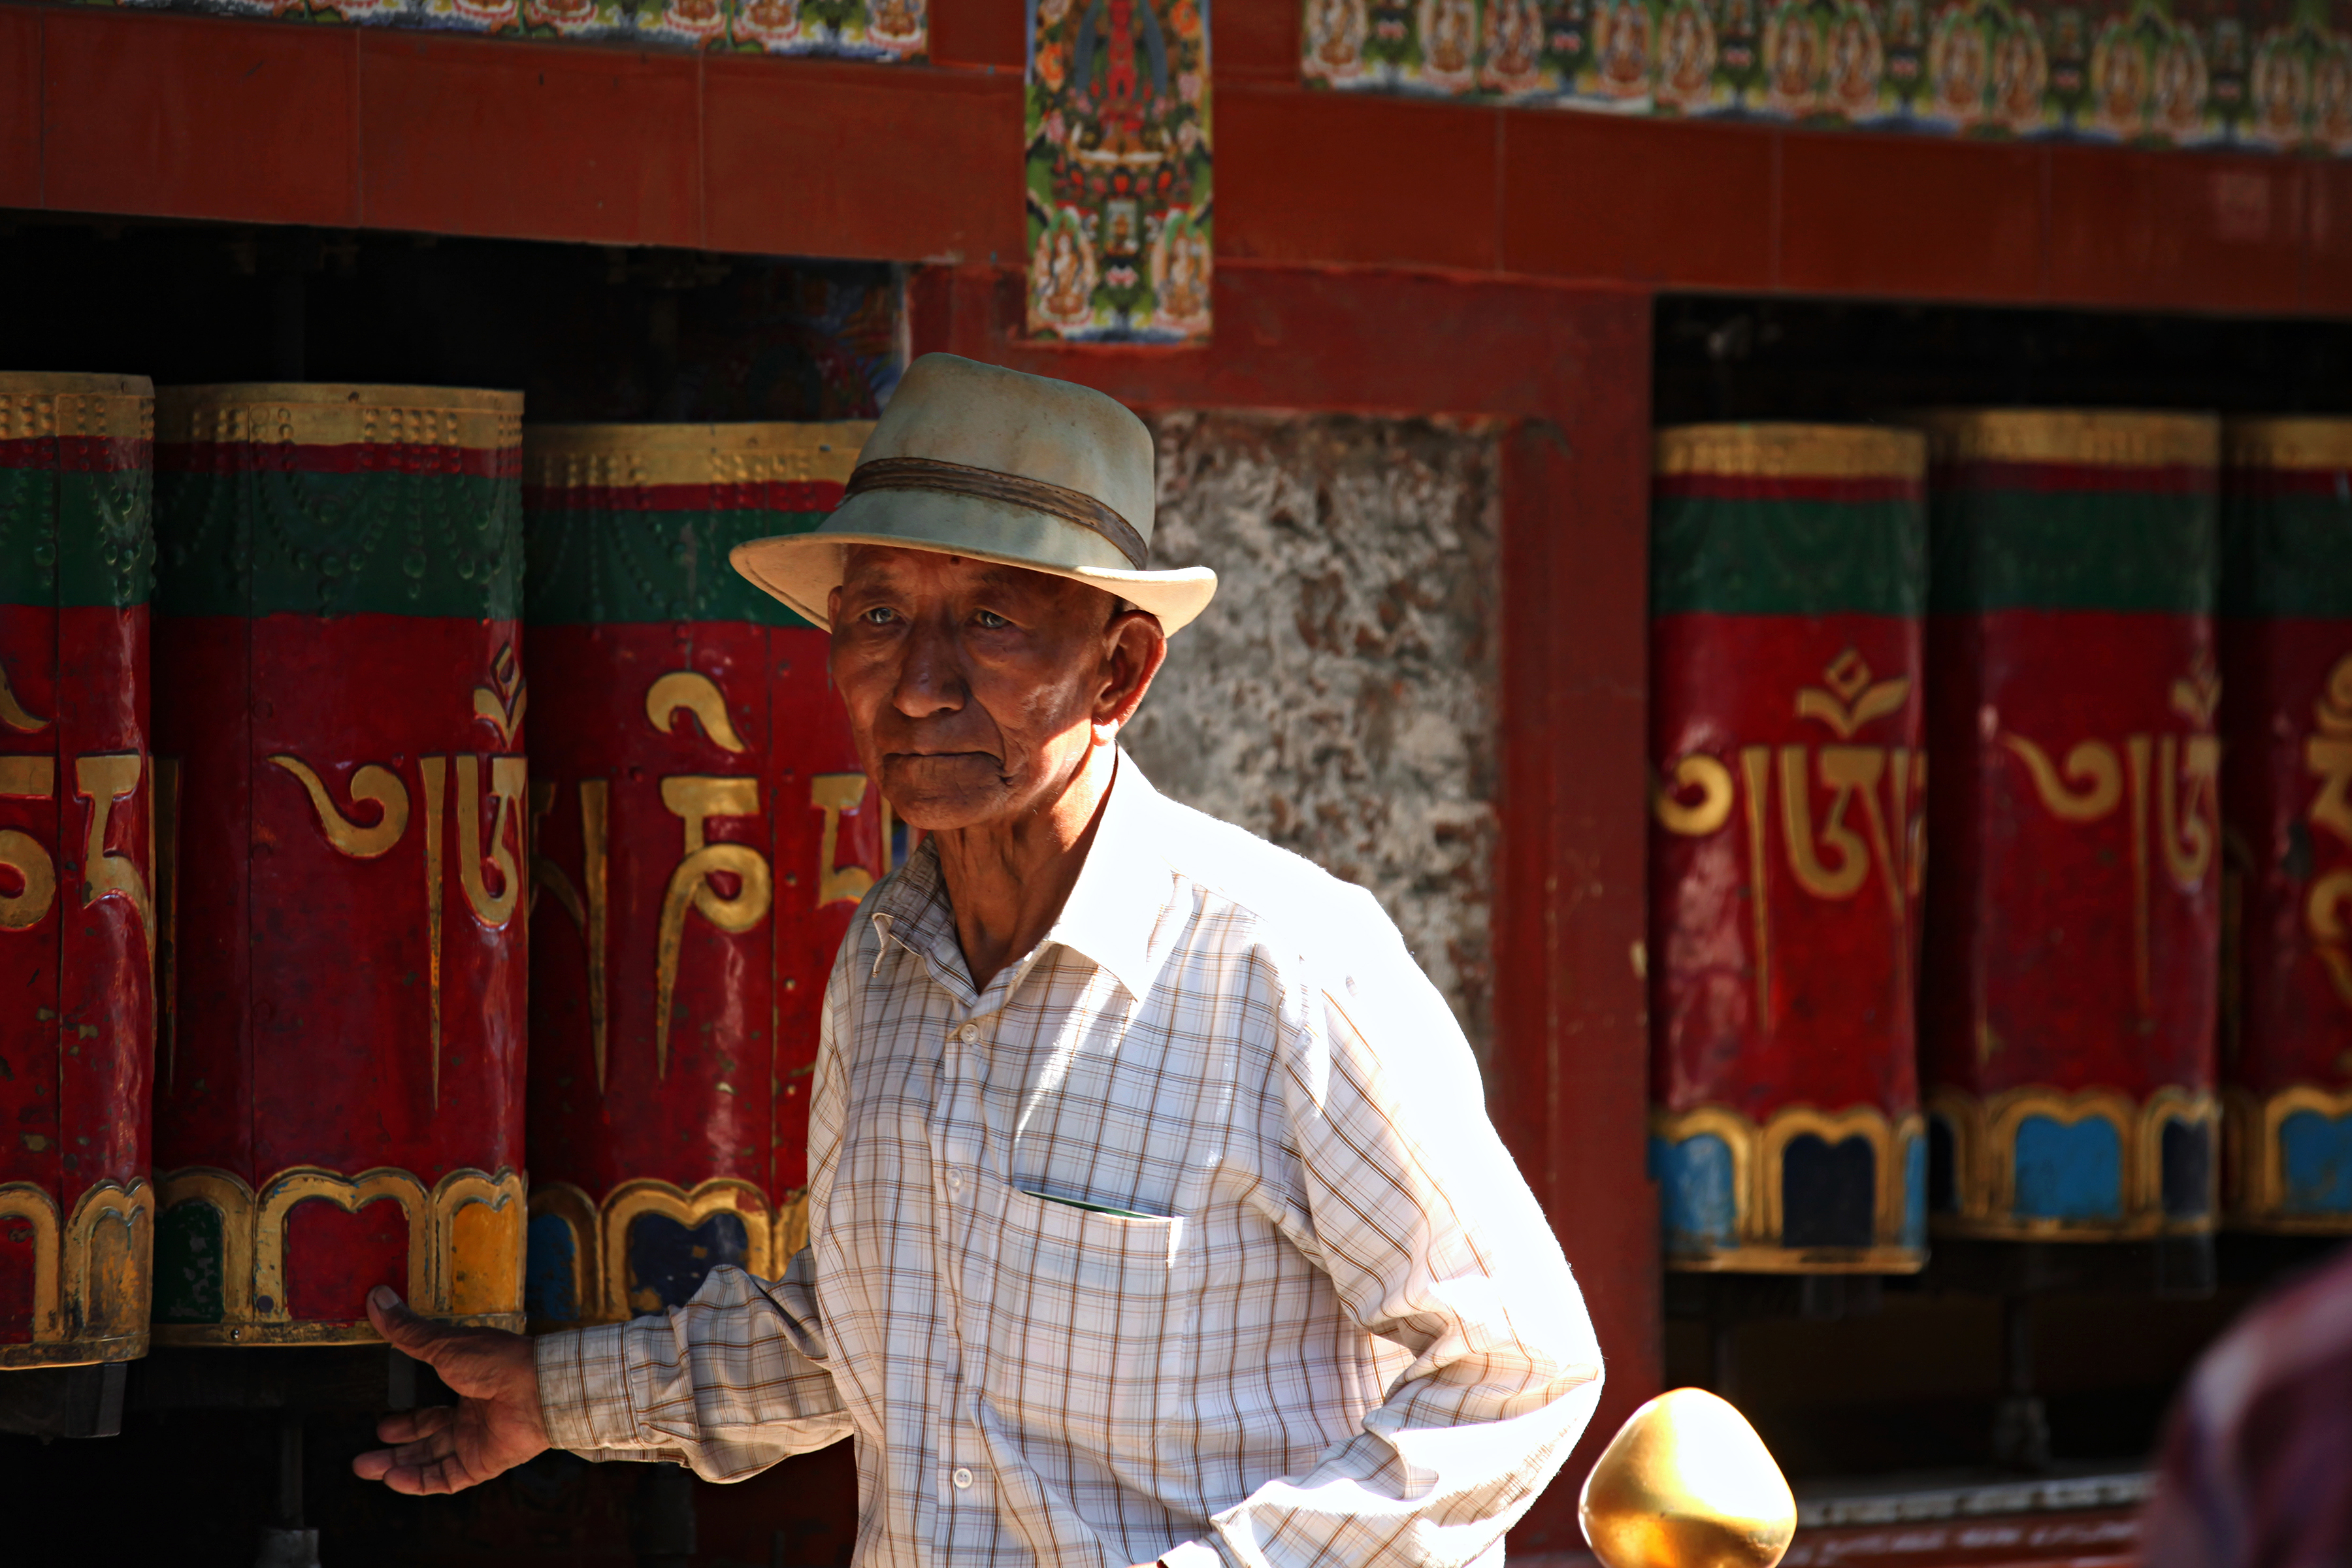 Man Standing Near Red Wooden Wall